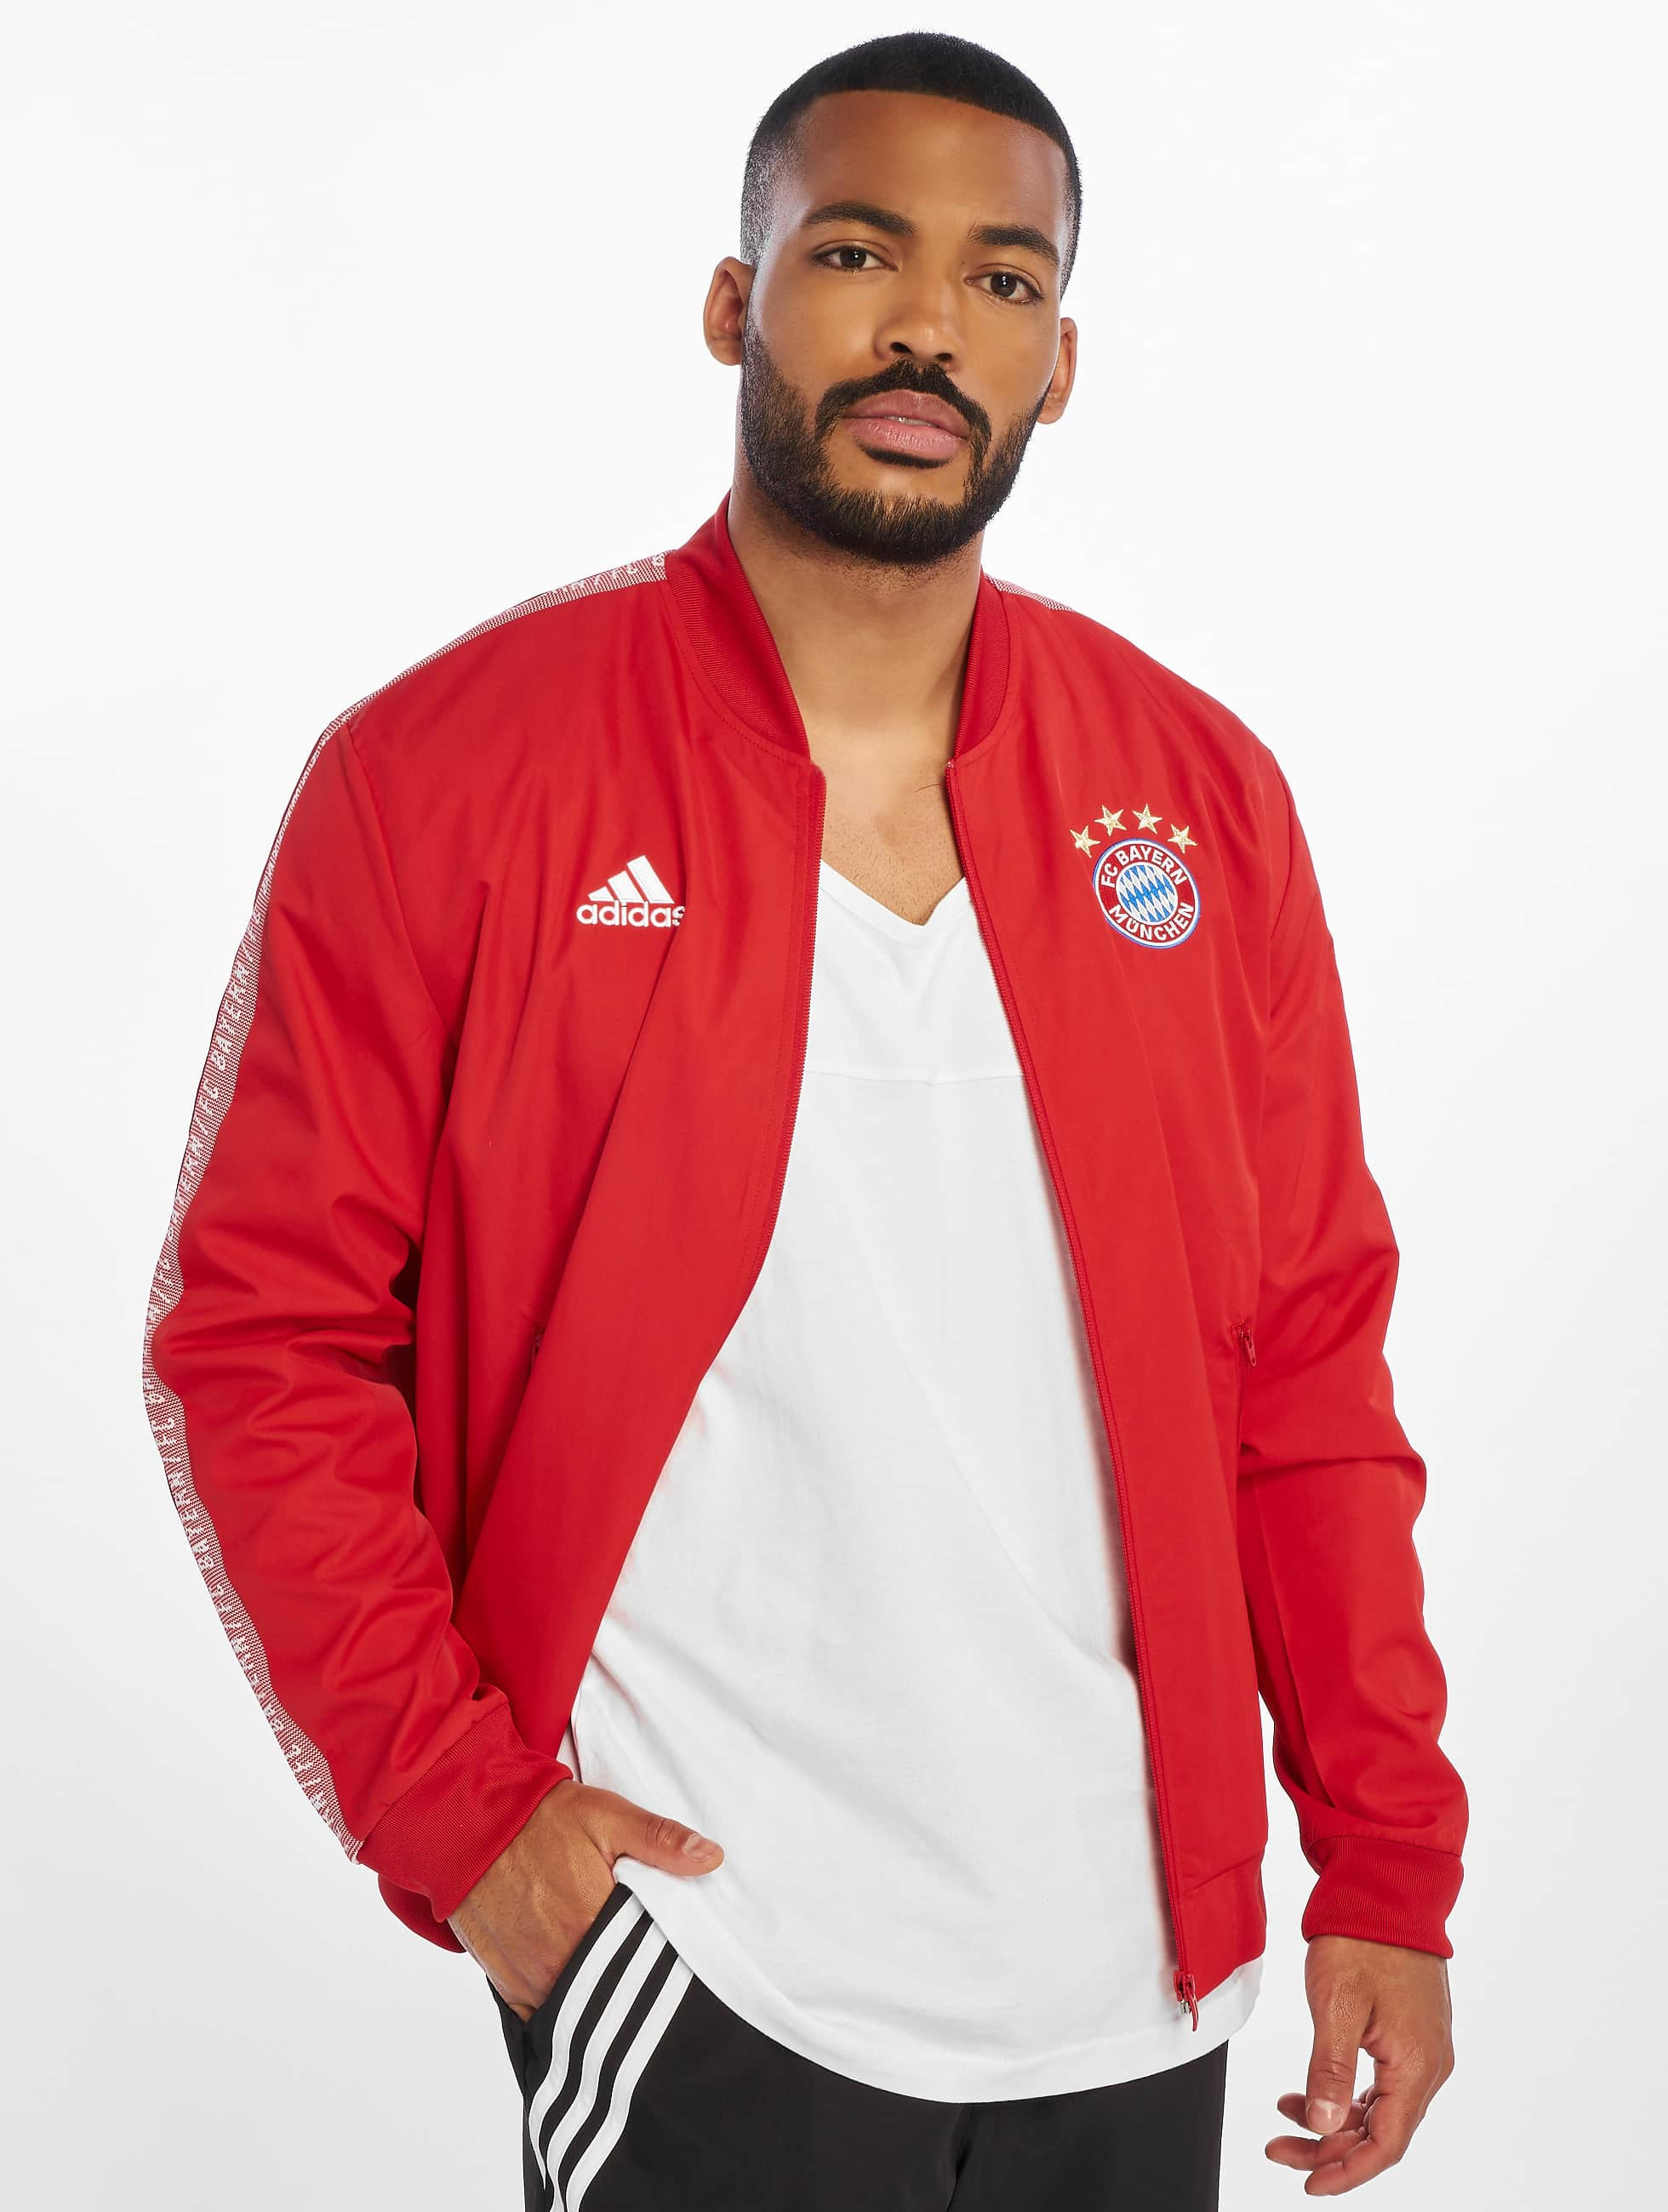 premium selection cd34a 09a76 adidas-performance-jalkapallovarusteet-punainen-683687.jpg